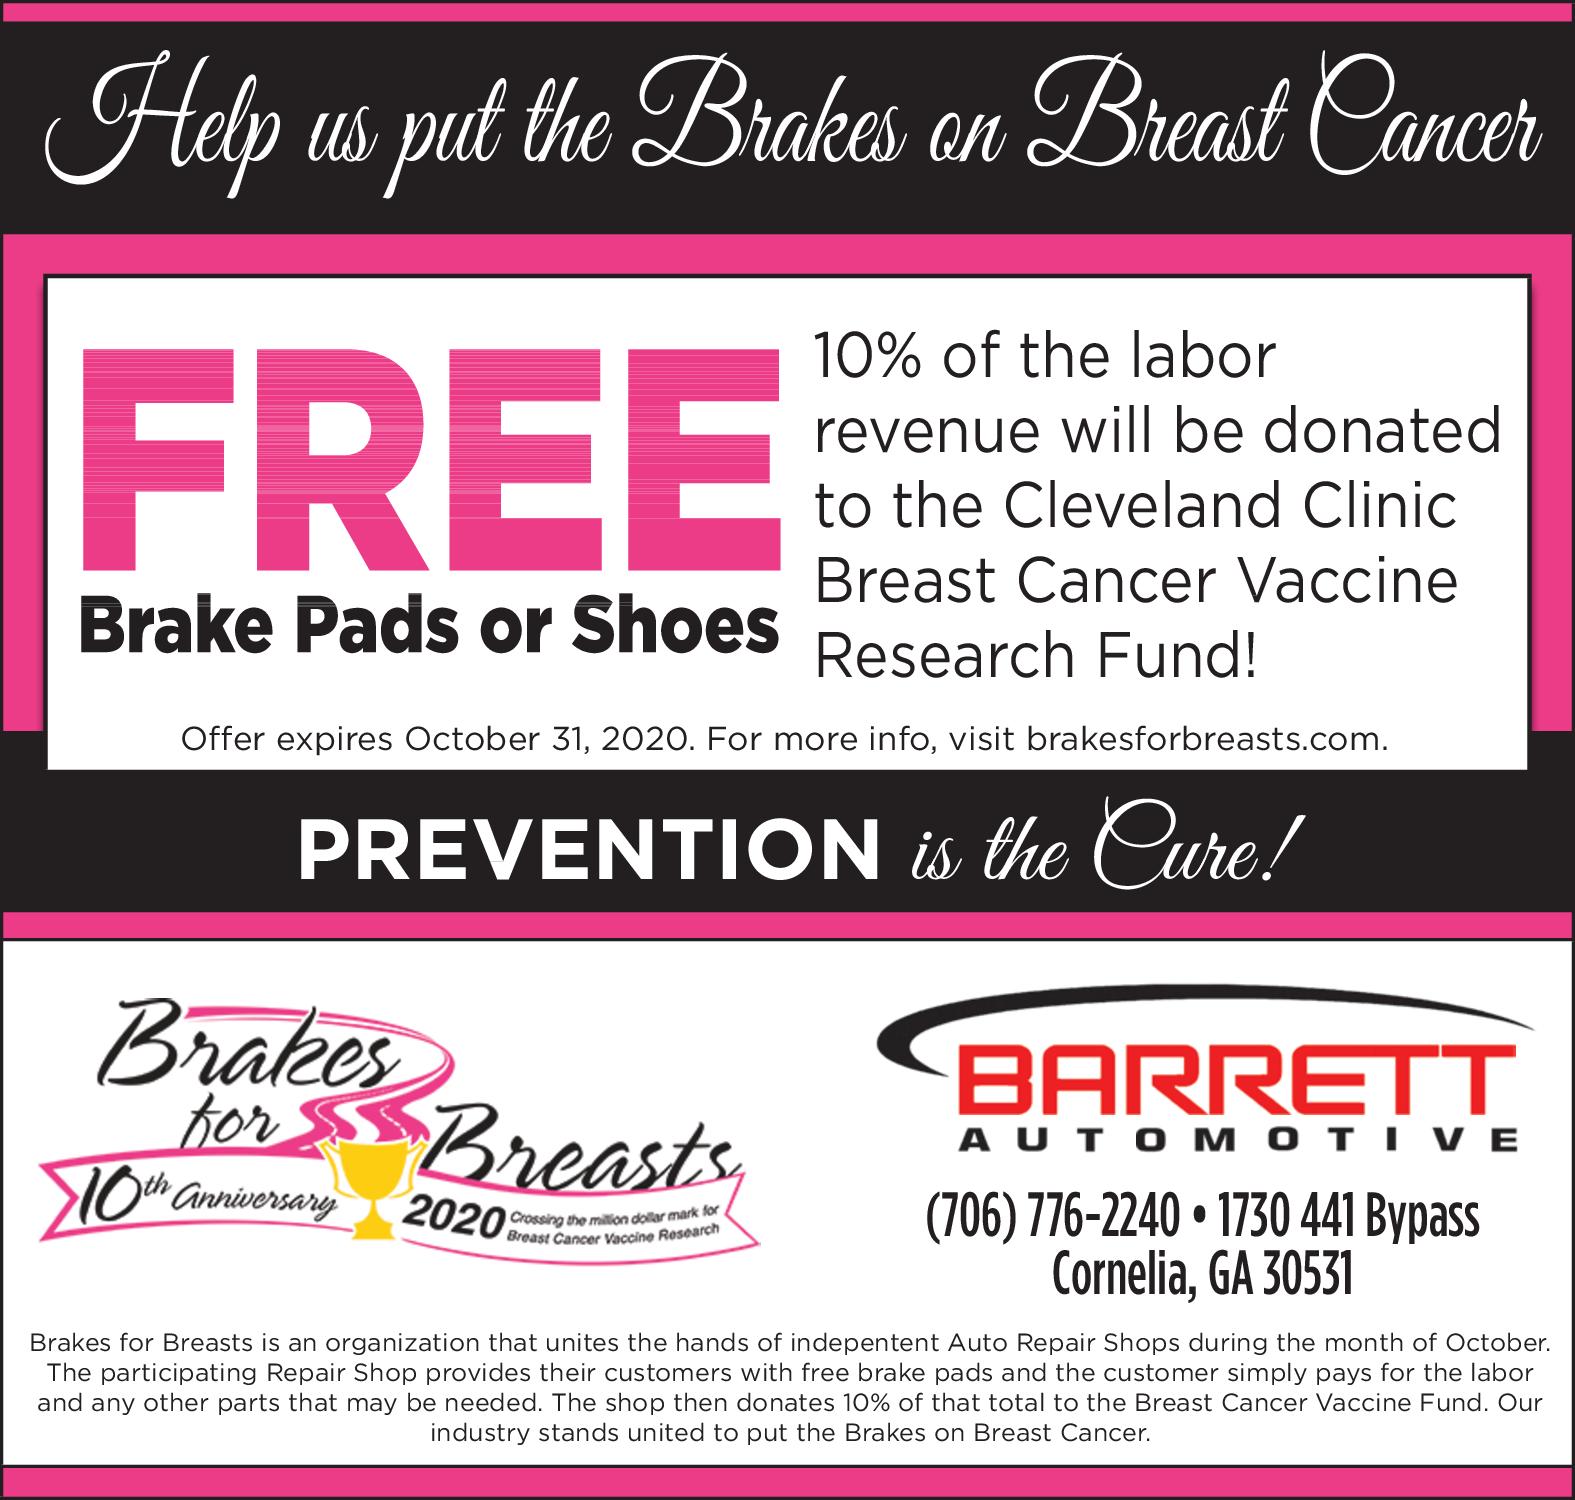 get free brake pads or shoes in cornelia ga auto repair barrett automotive and tire mercolocal